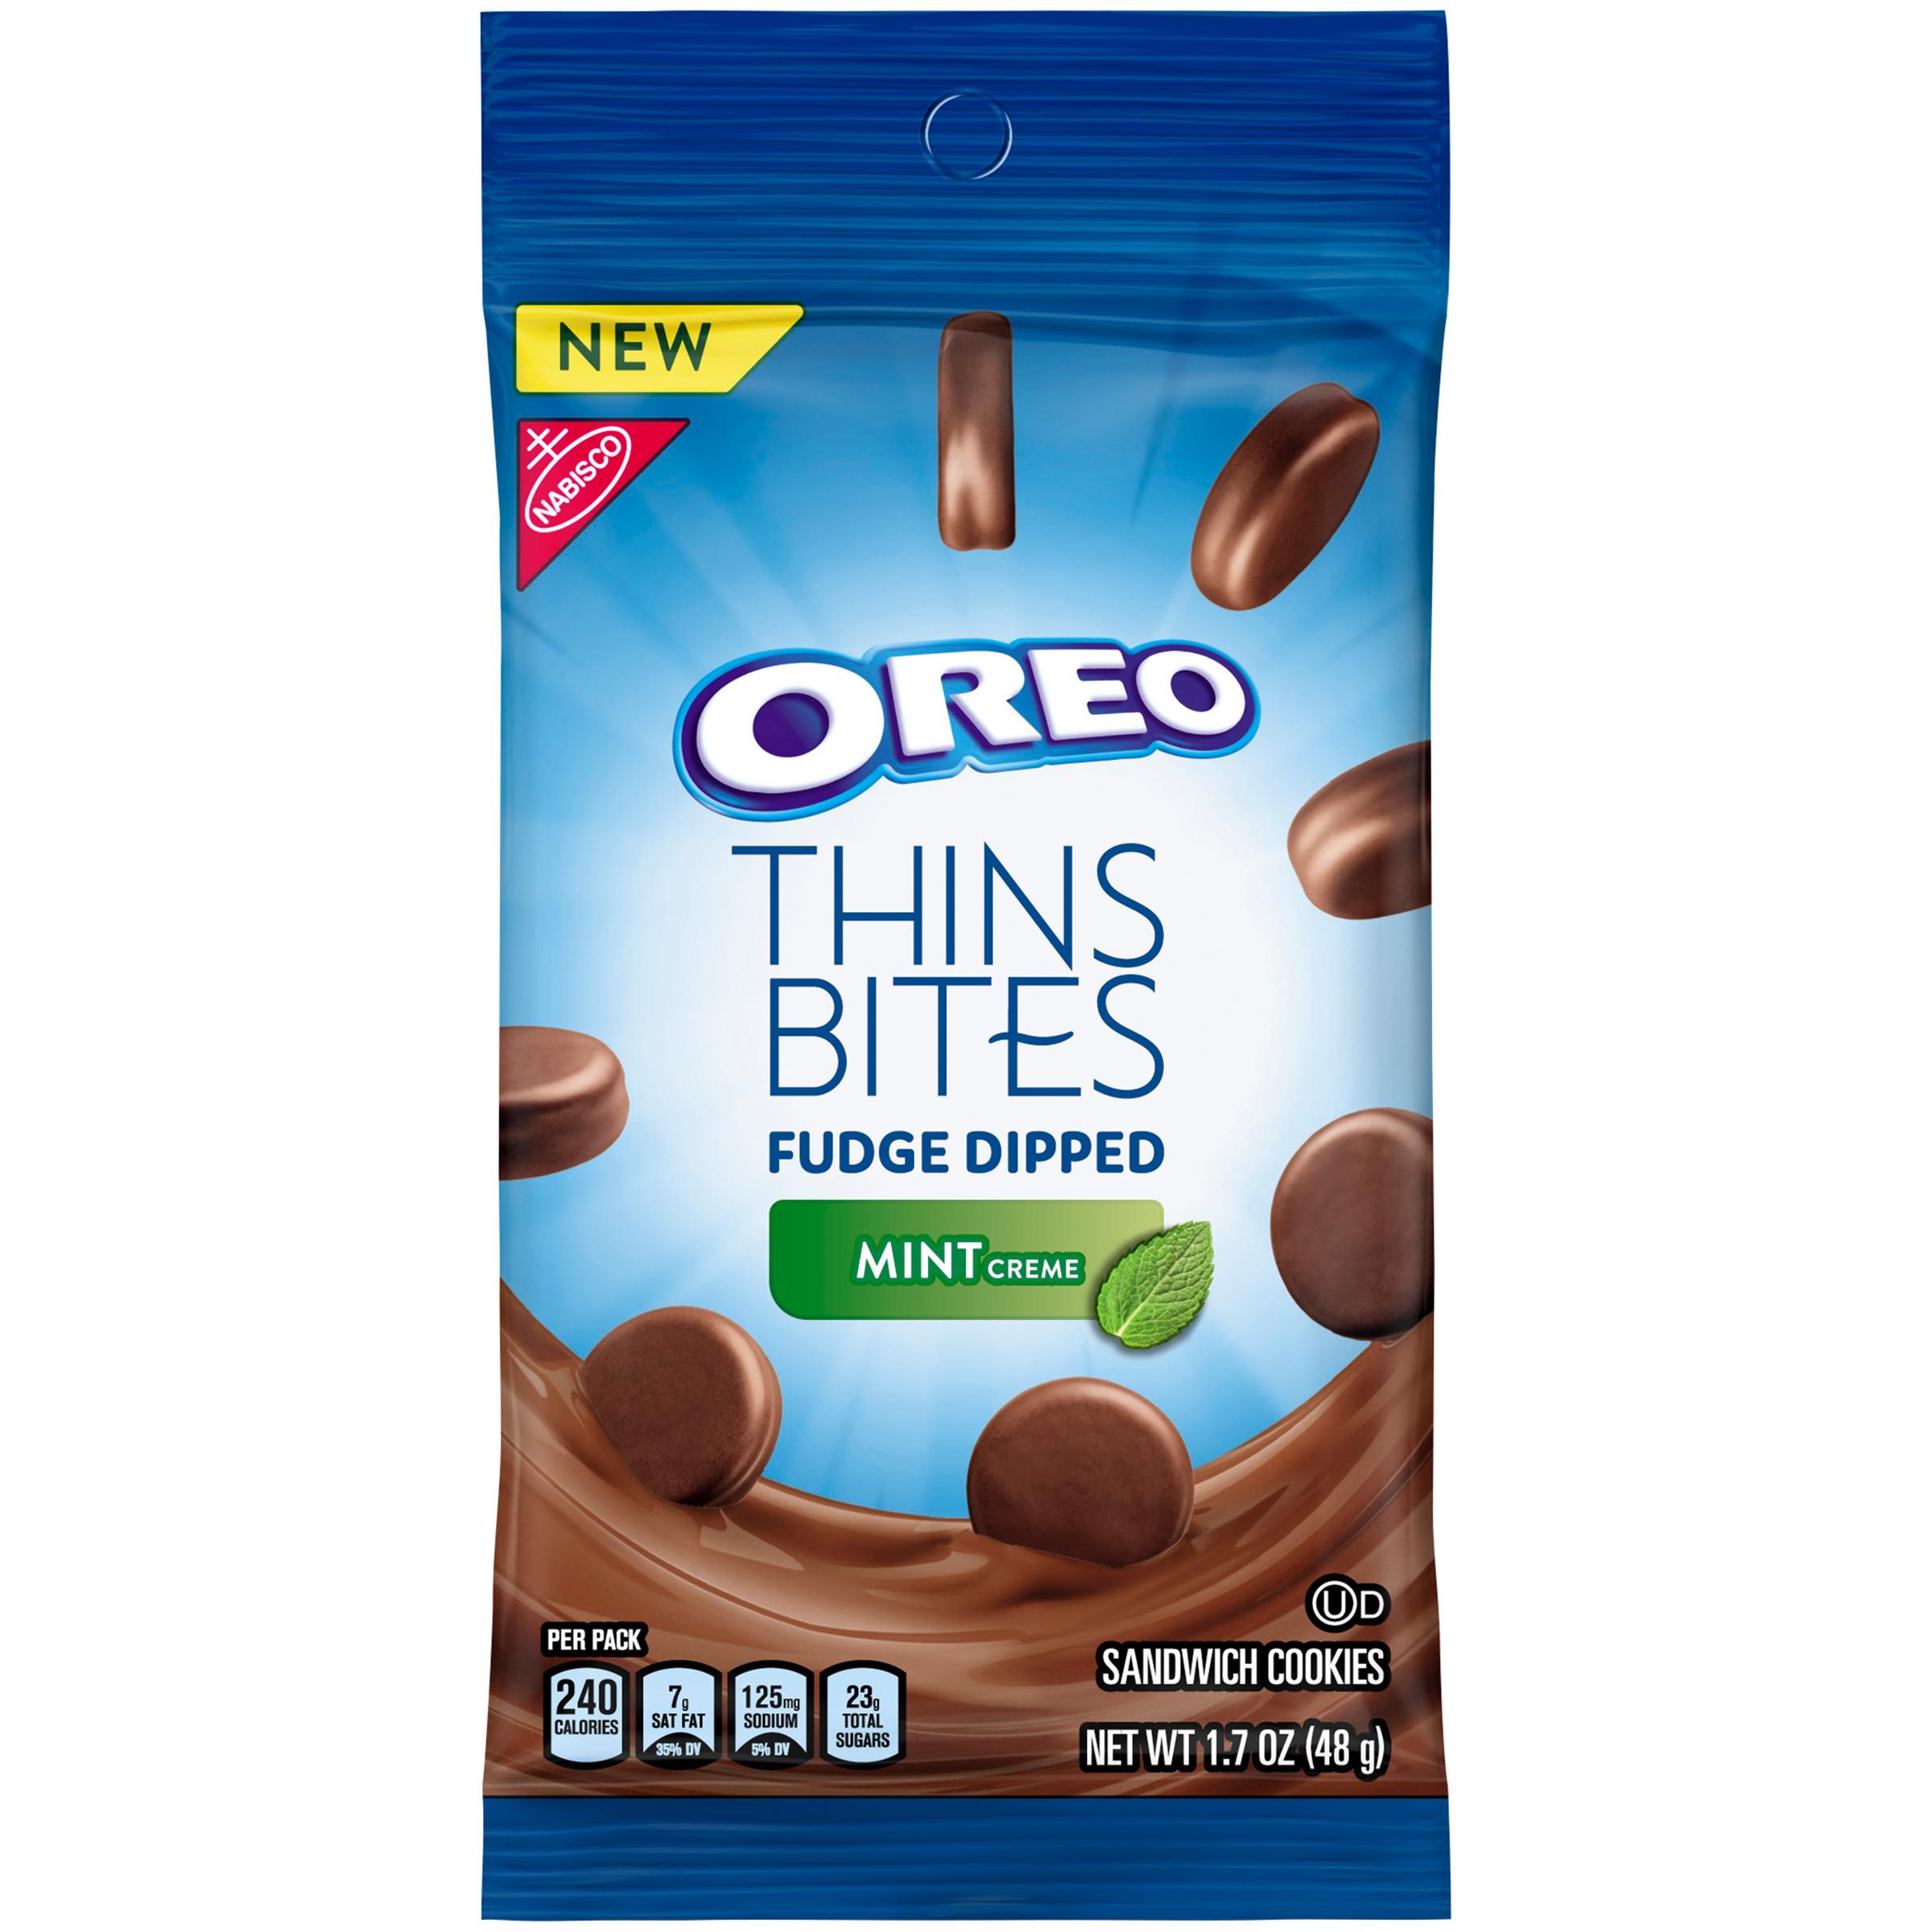 OREO Thin Bites Dipped Mint Creme Cookies 1.7 oz